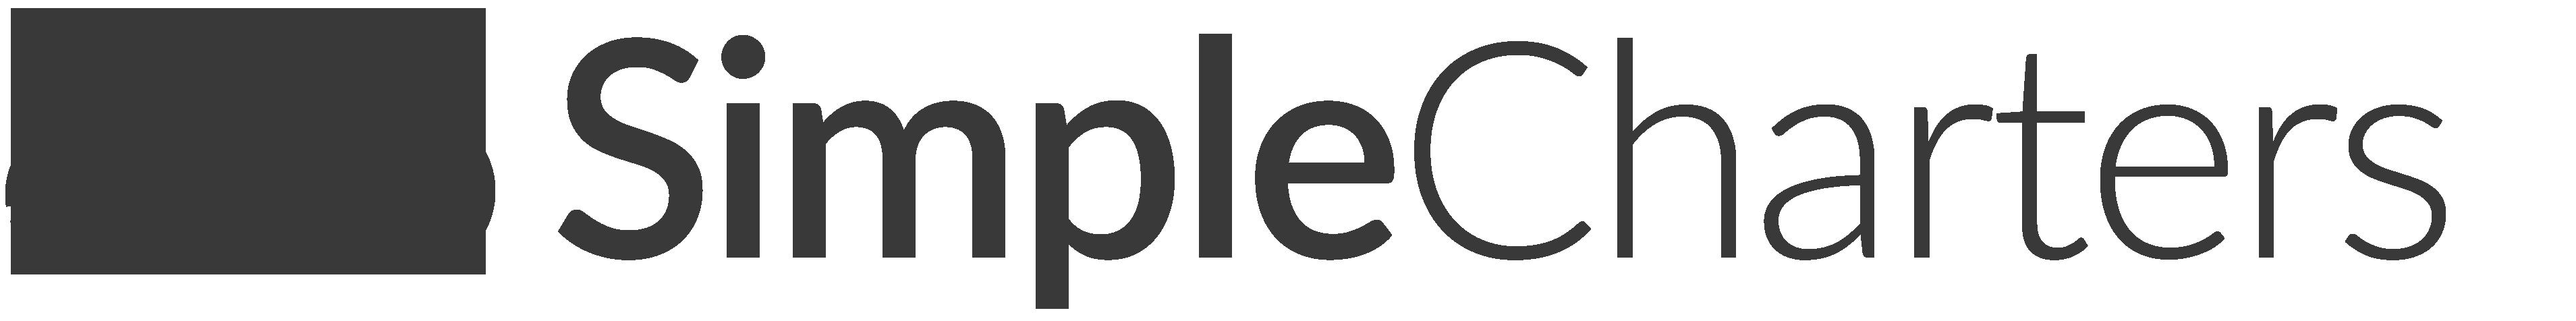 SimpleCharters Logo